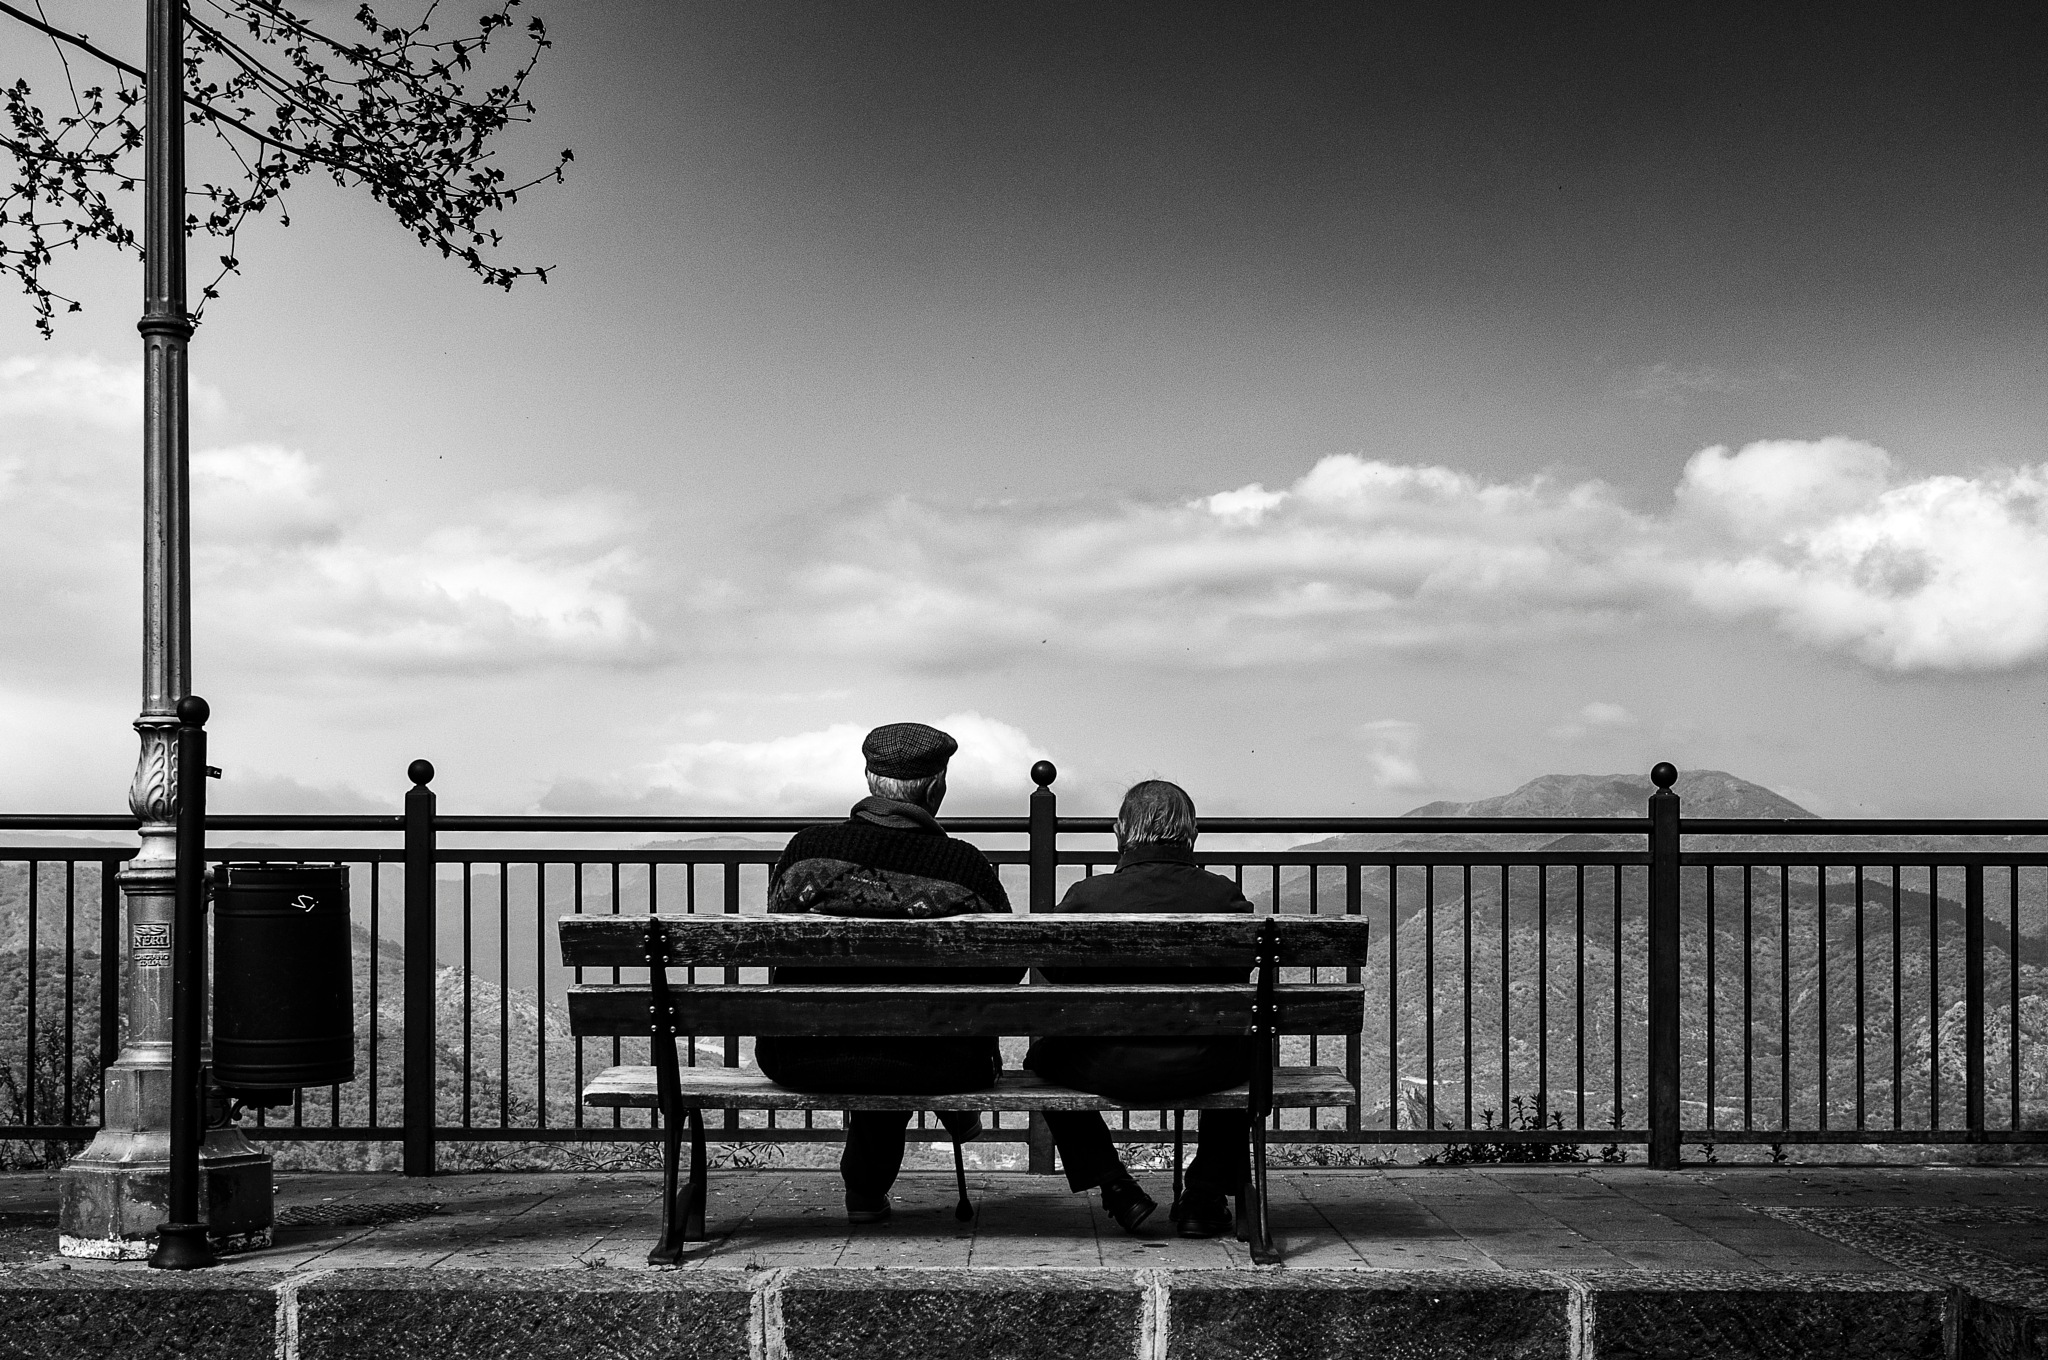 Old Men Waiting by Marian Hummel